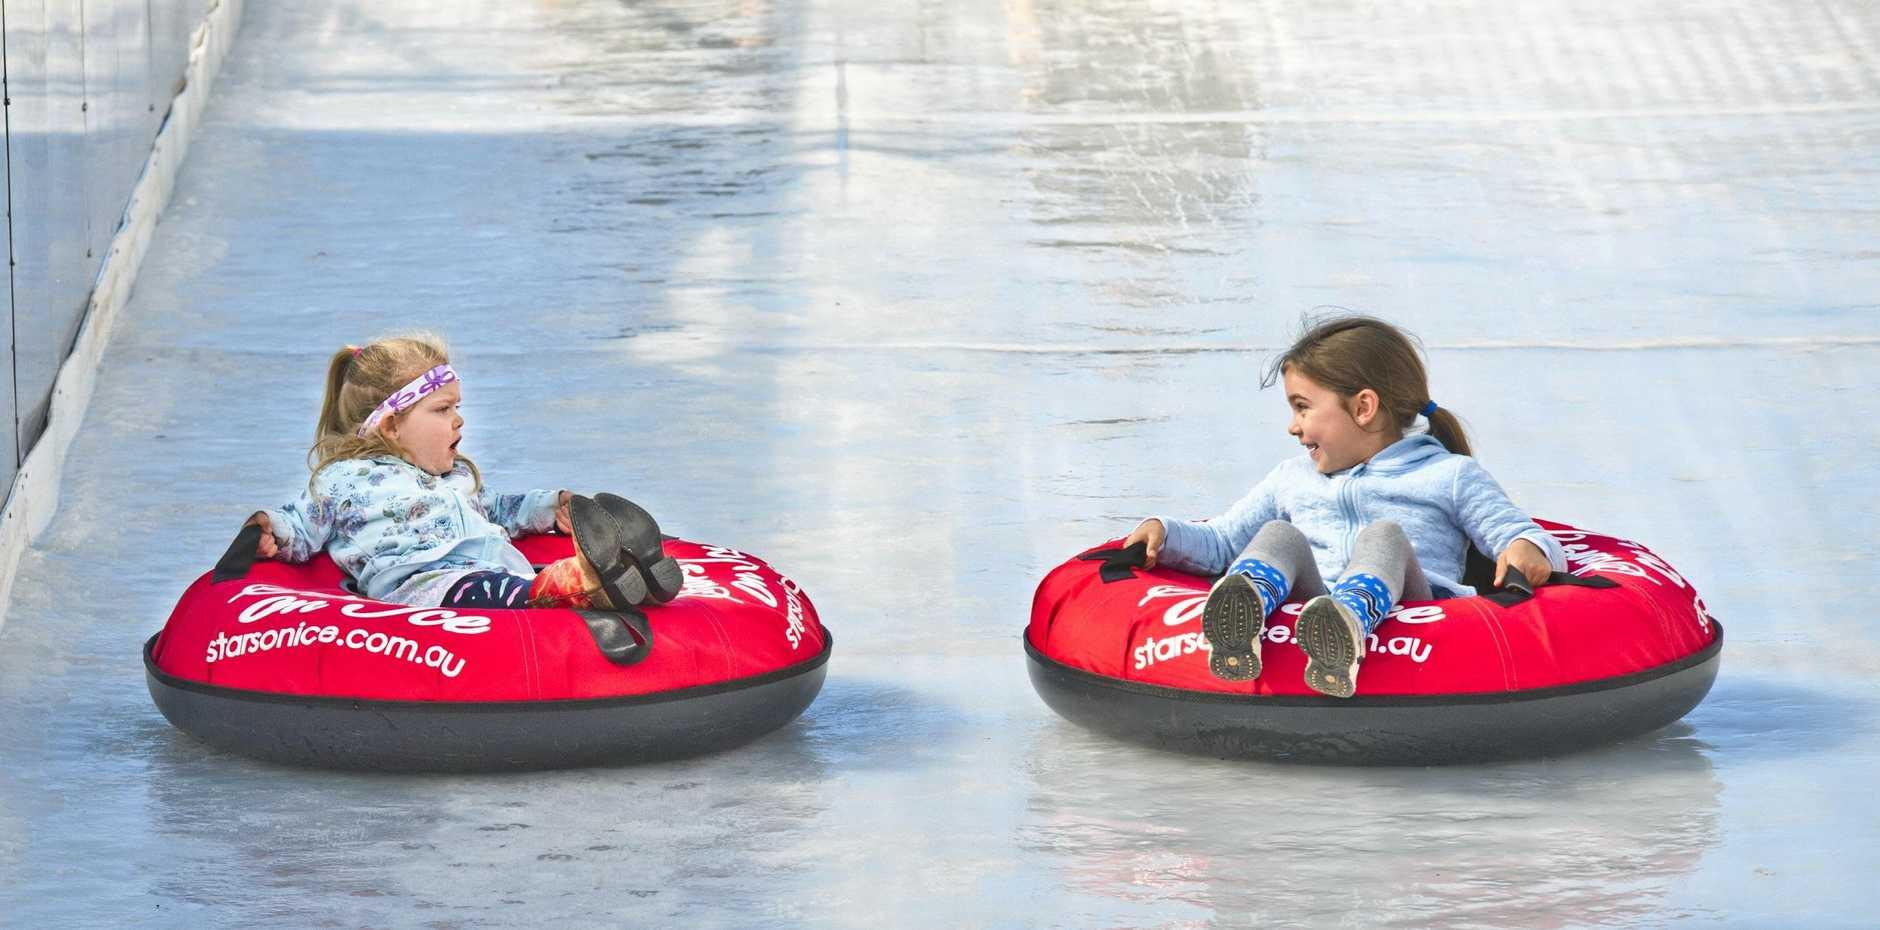 Sisters Mackenzie and Lexi Burlingham take on the Ice Slide at Winter Wonderland in Toowoomba.